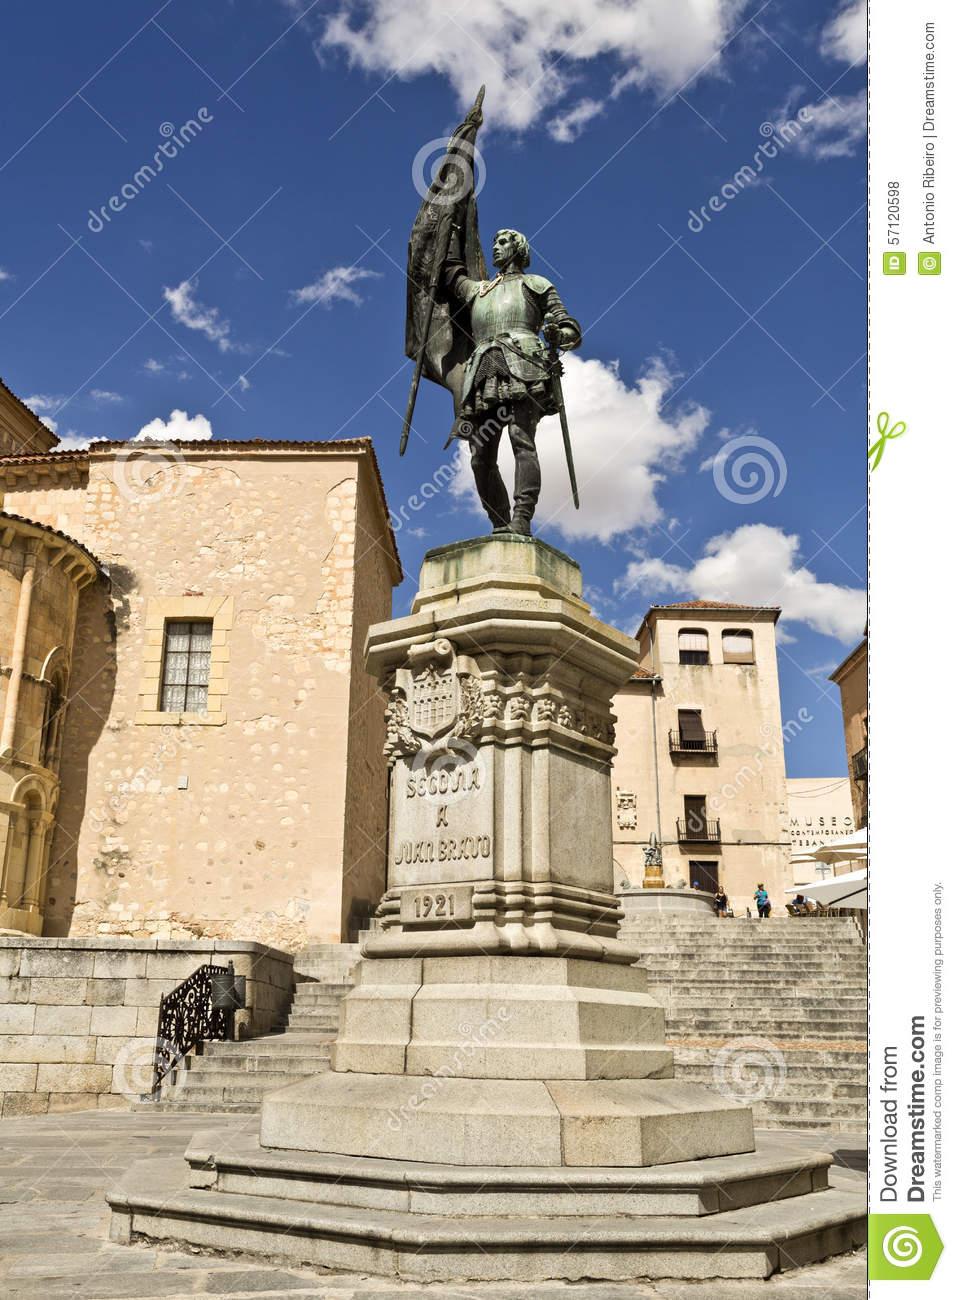 Segovia Statue To Juan Bravo Stock Photo.